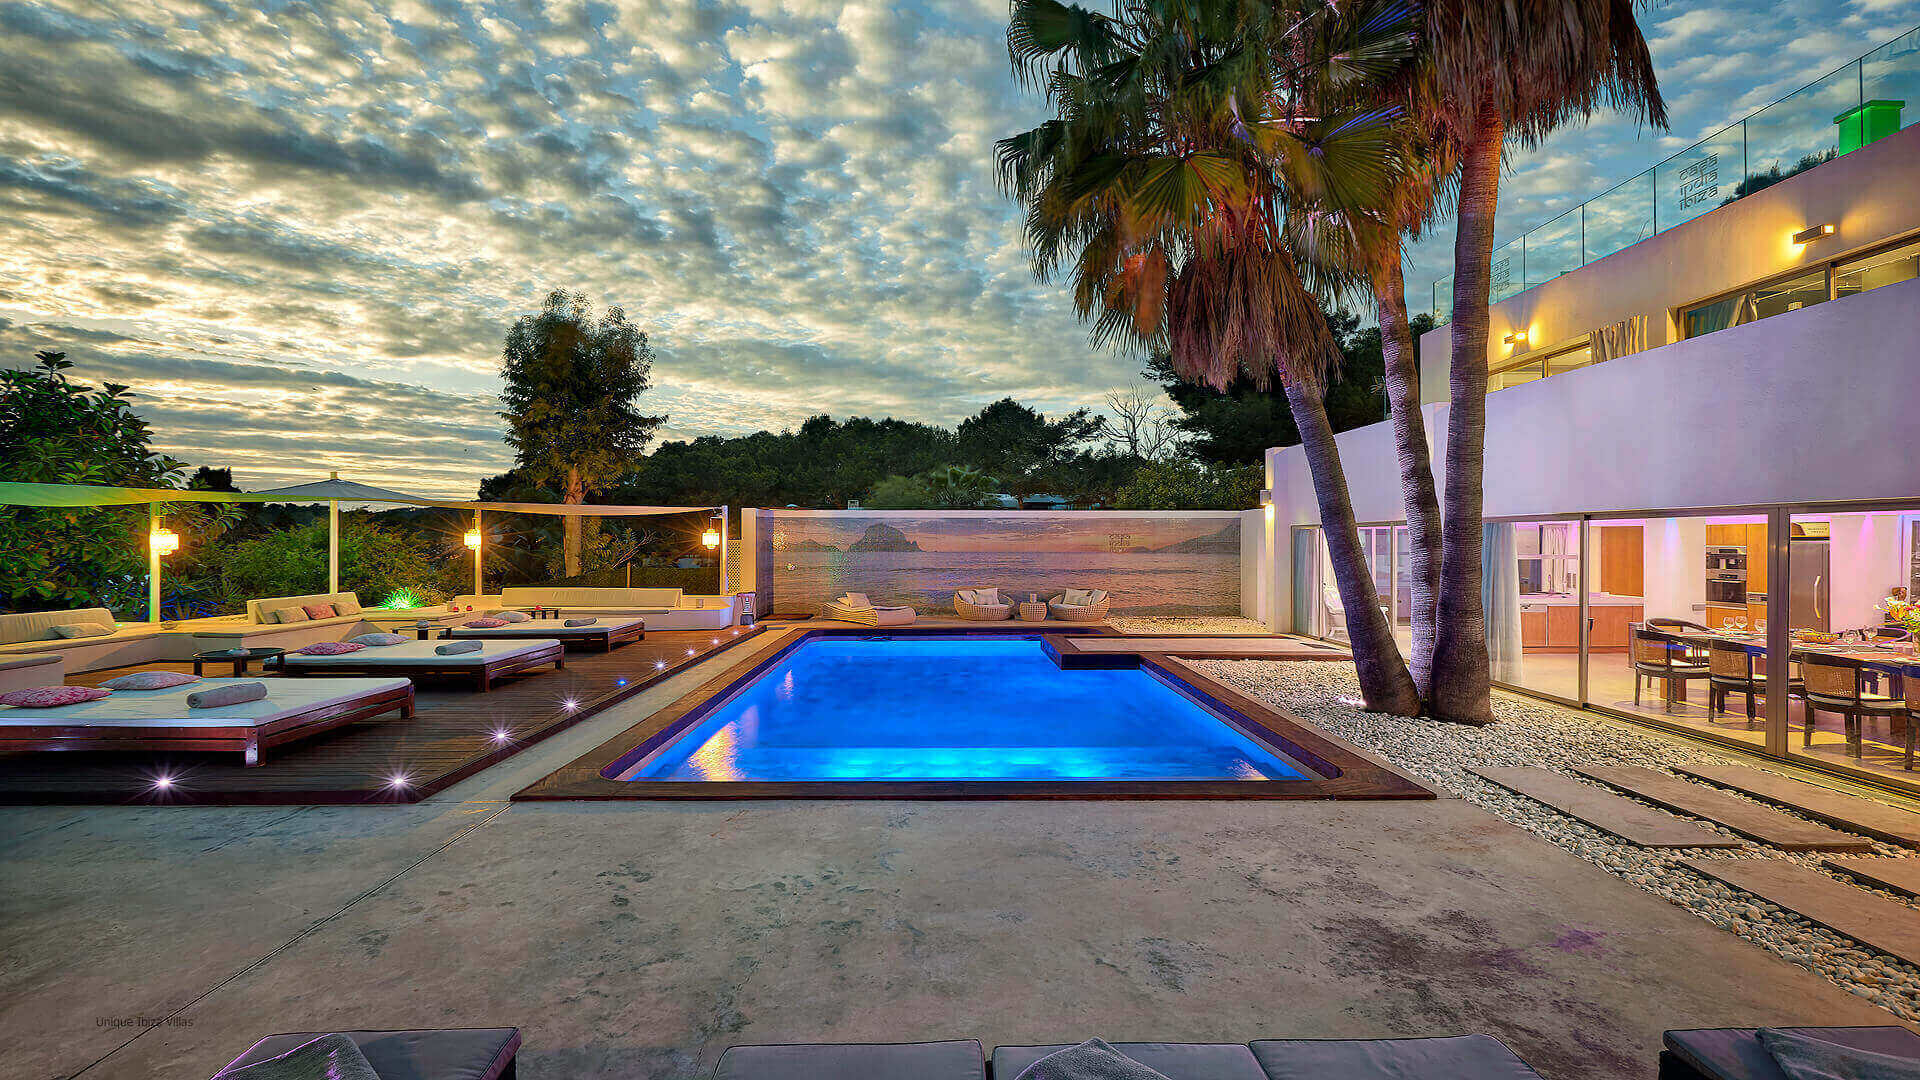 Casa India Ibiza 2 Roca Llisa